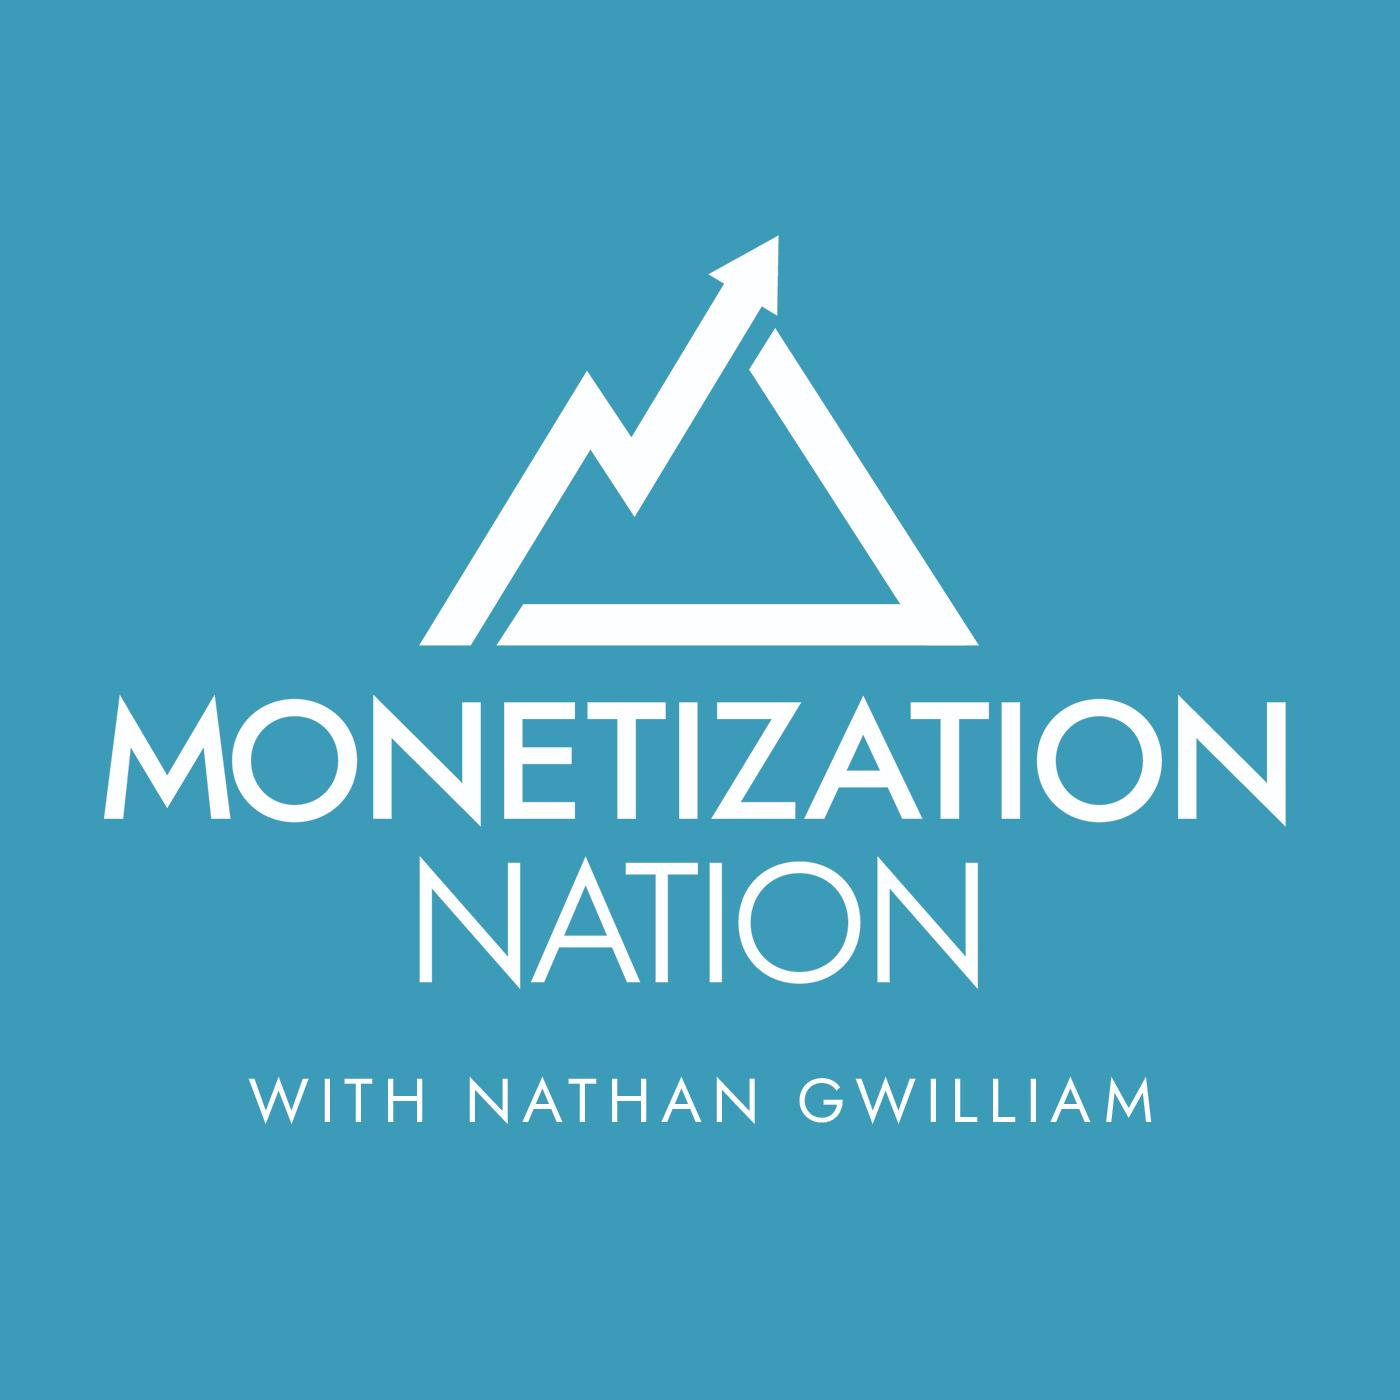 Monetization Nation Podcast show art